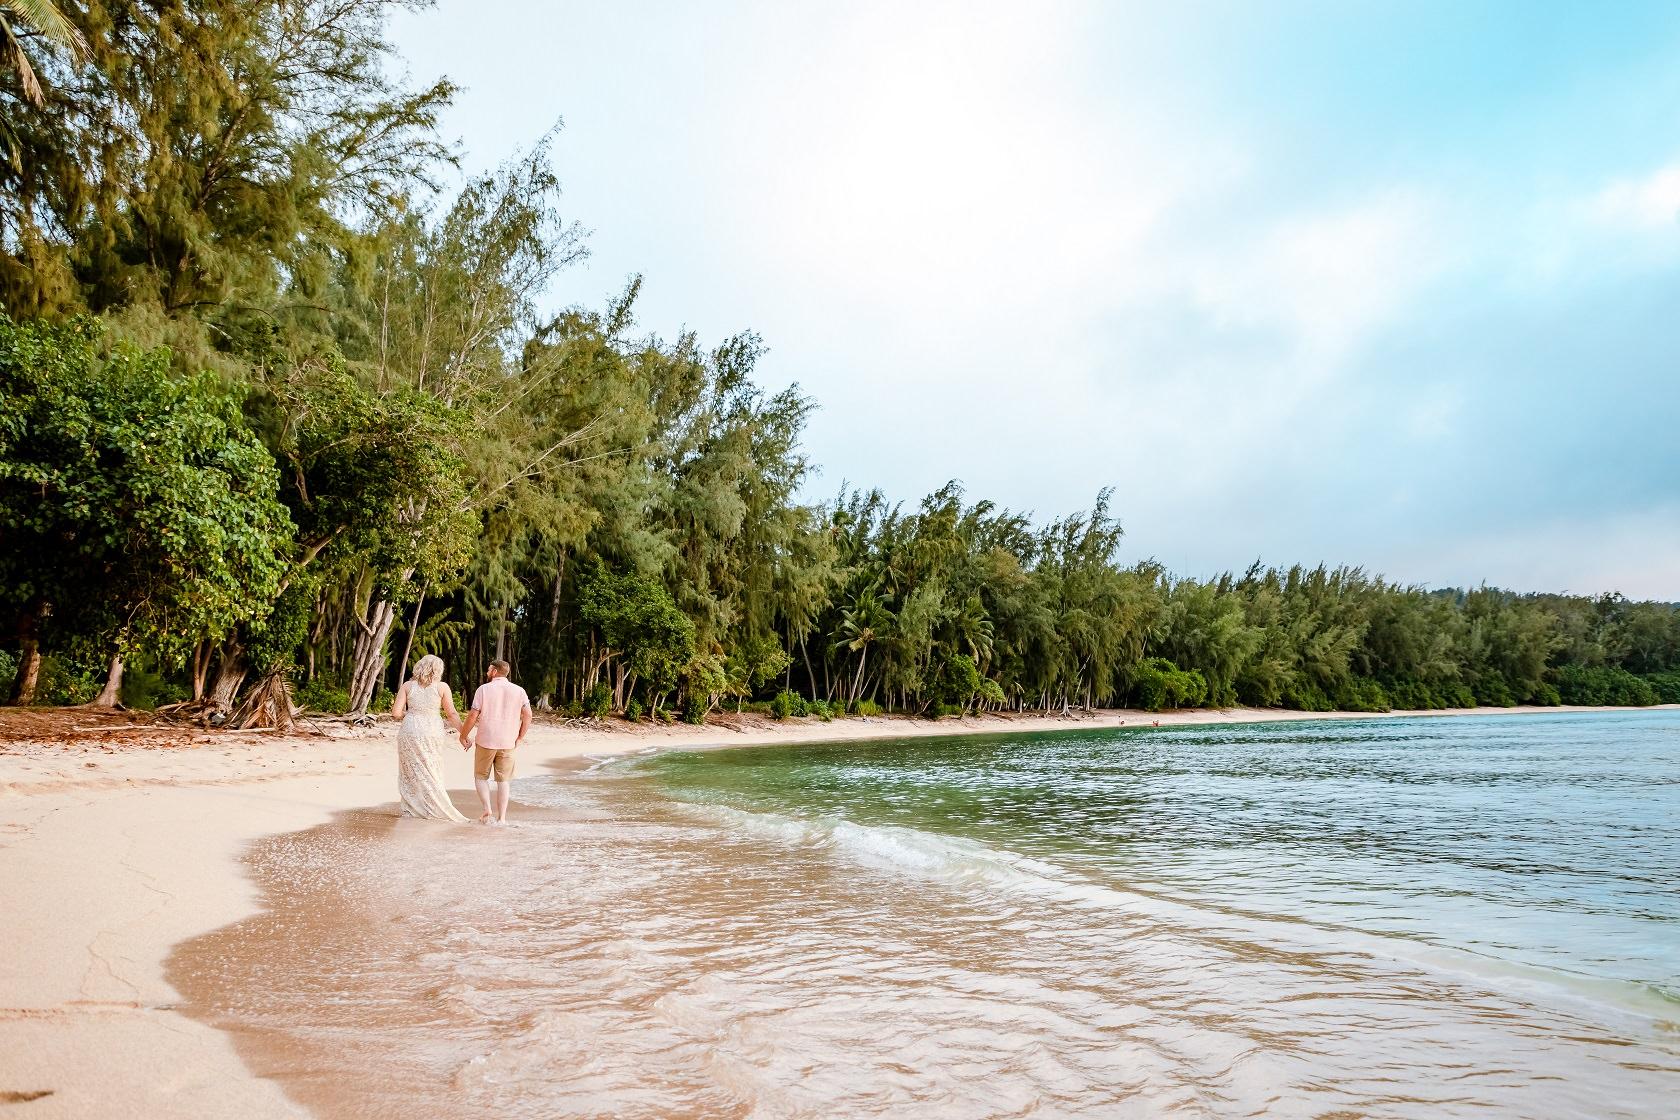 couples 10th anniversary oahu beach photo